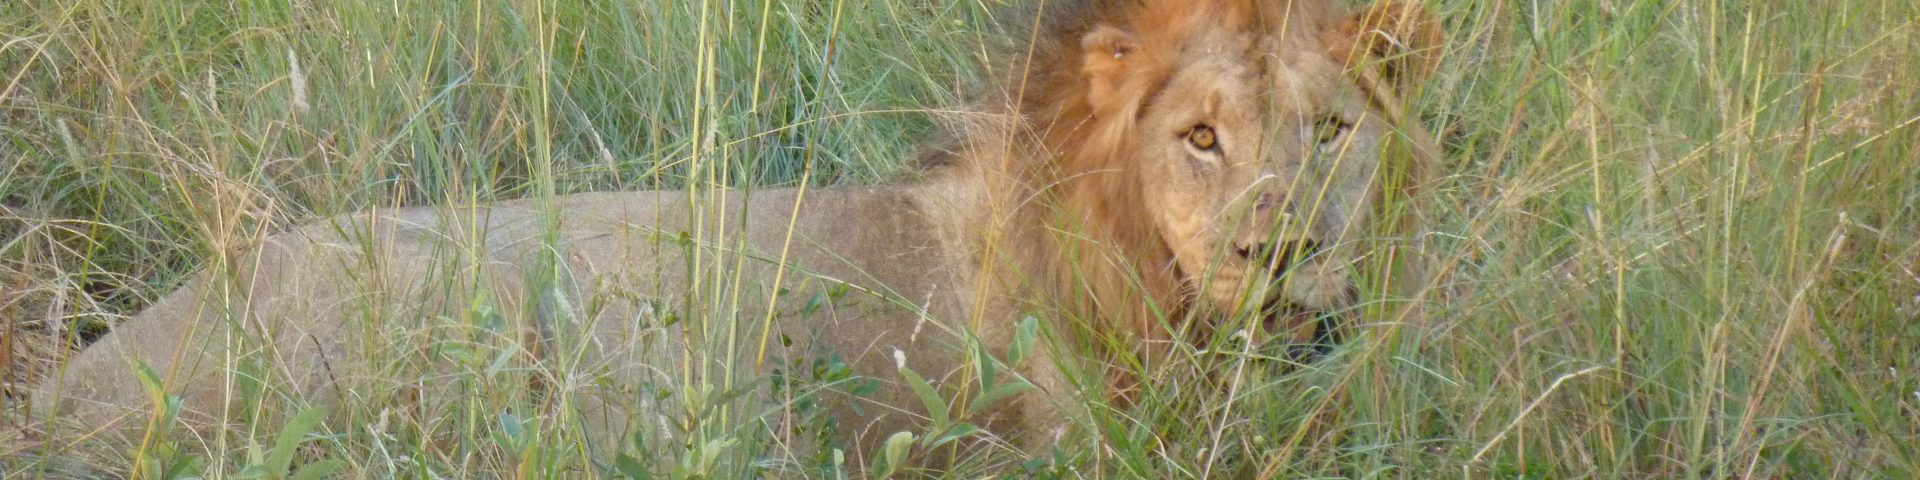 Safari del 2, Sydafrika - Madikwe 1